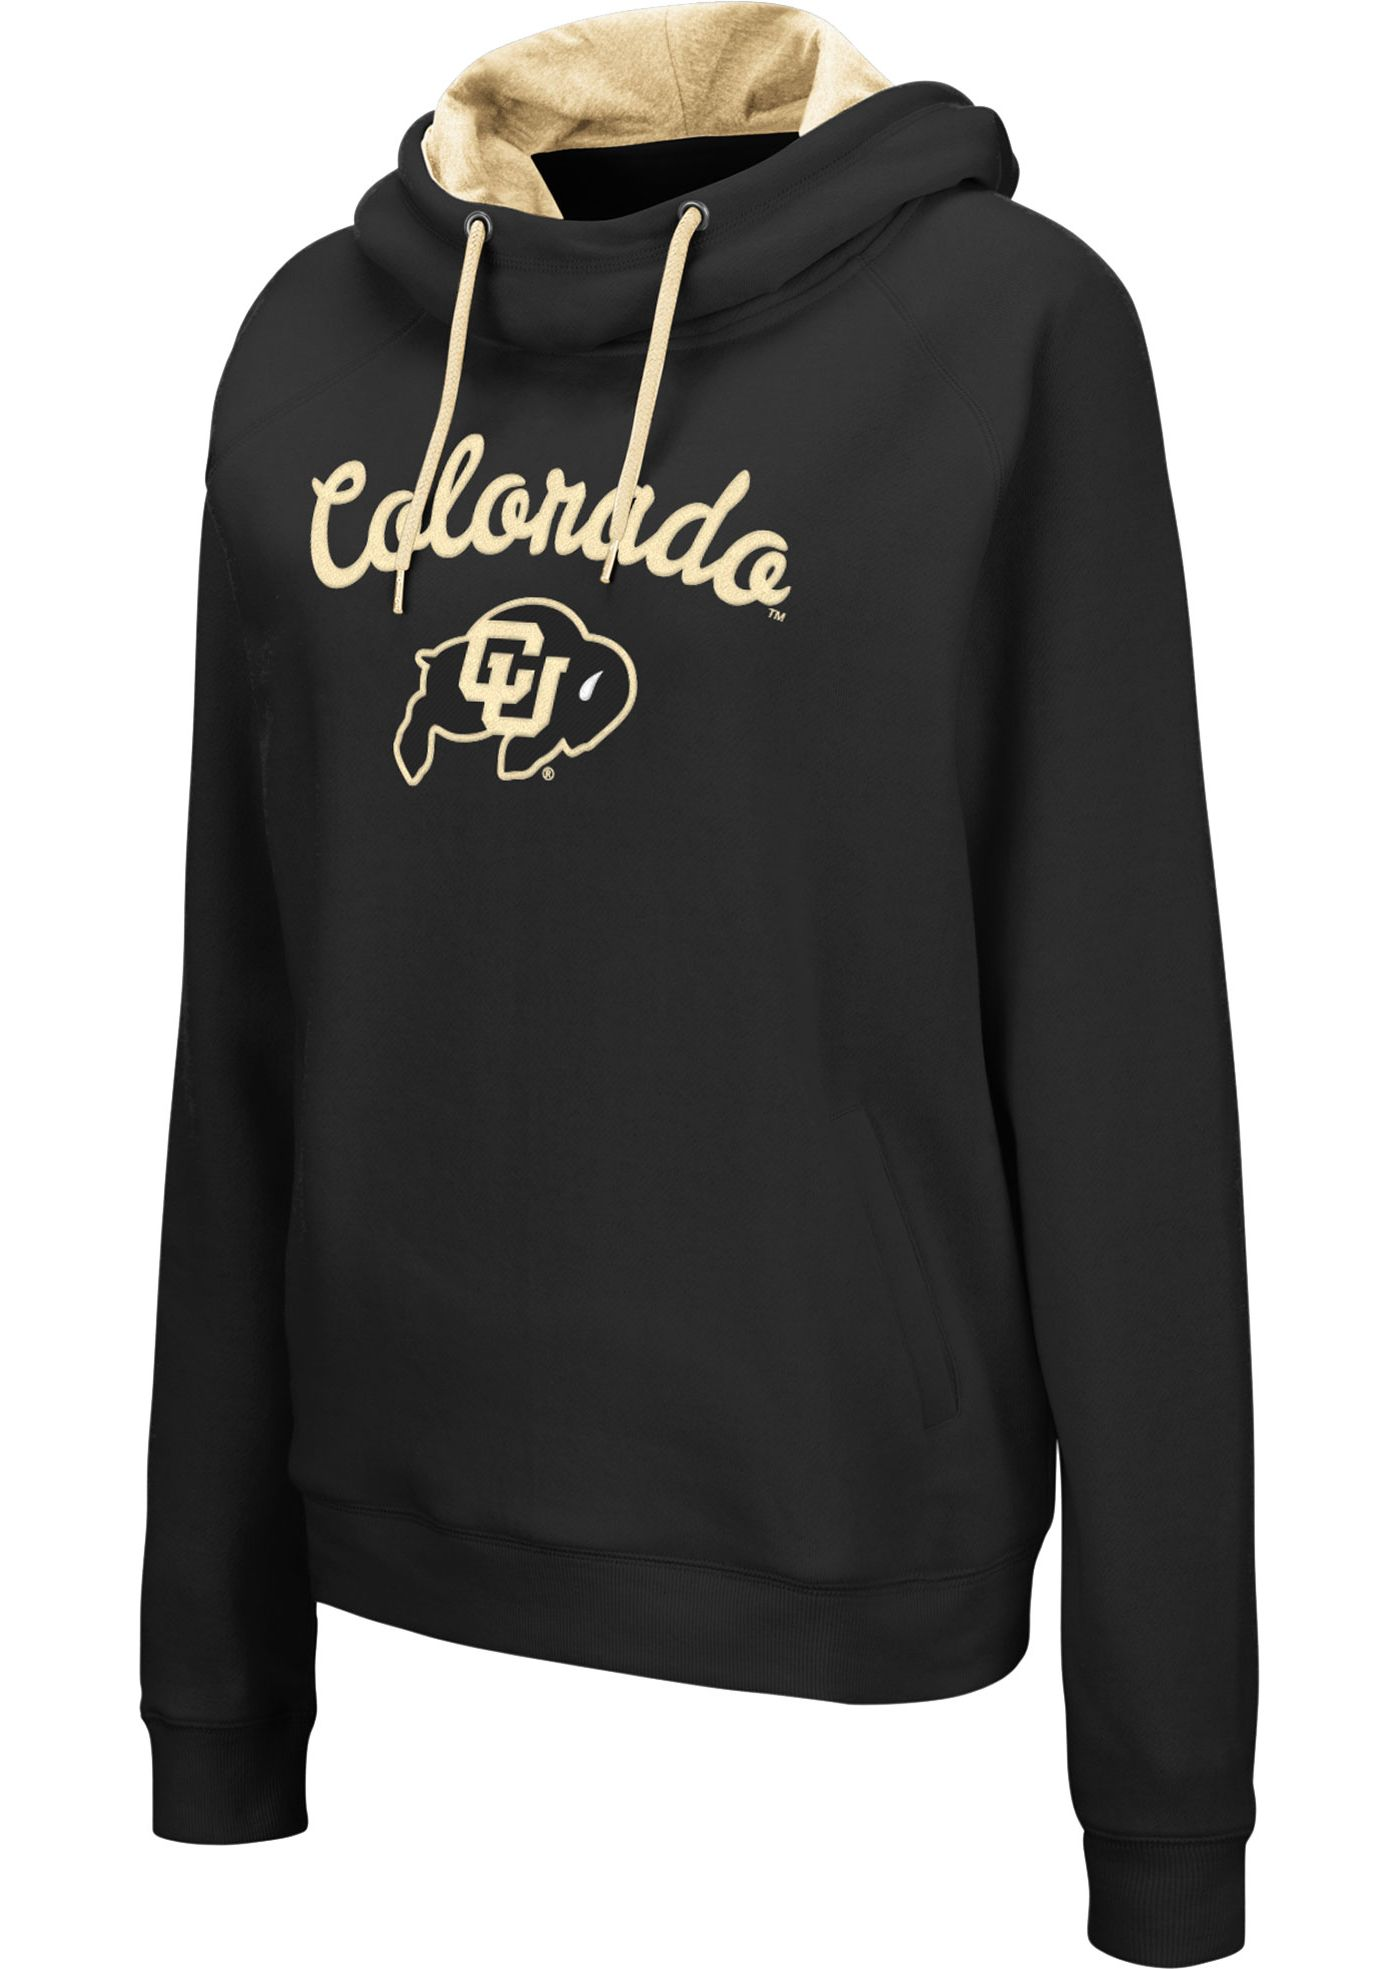 Colosseum Women's Colorado Buffaloes Louise Pullover Black Sweatshirt